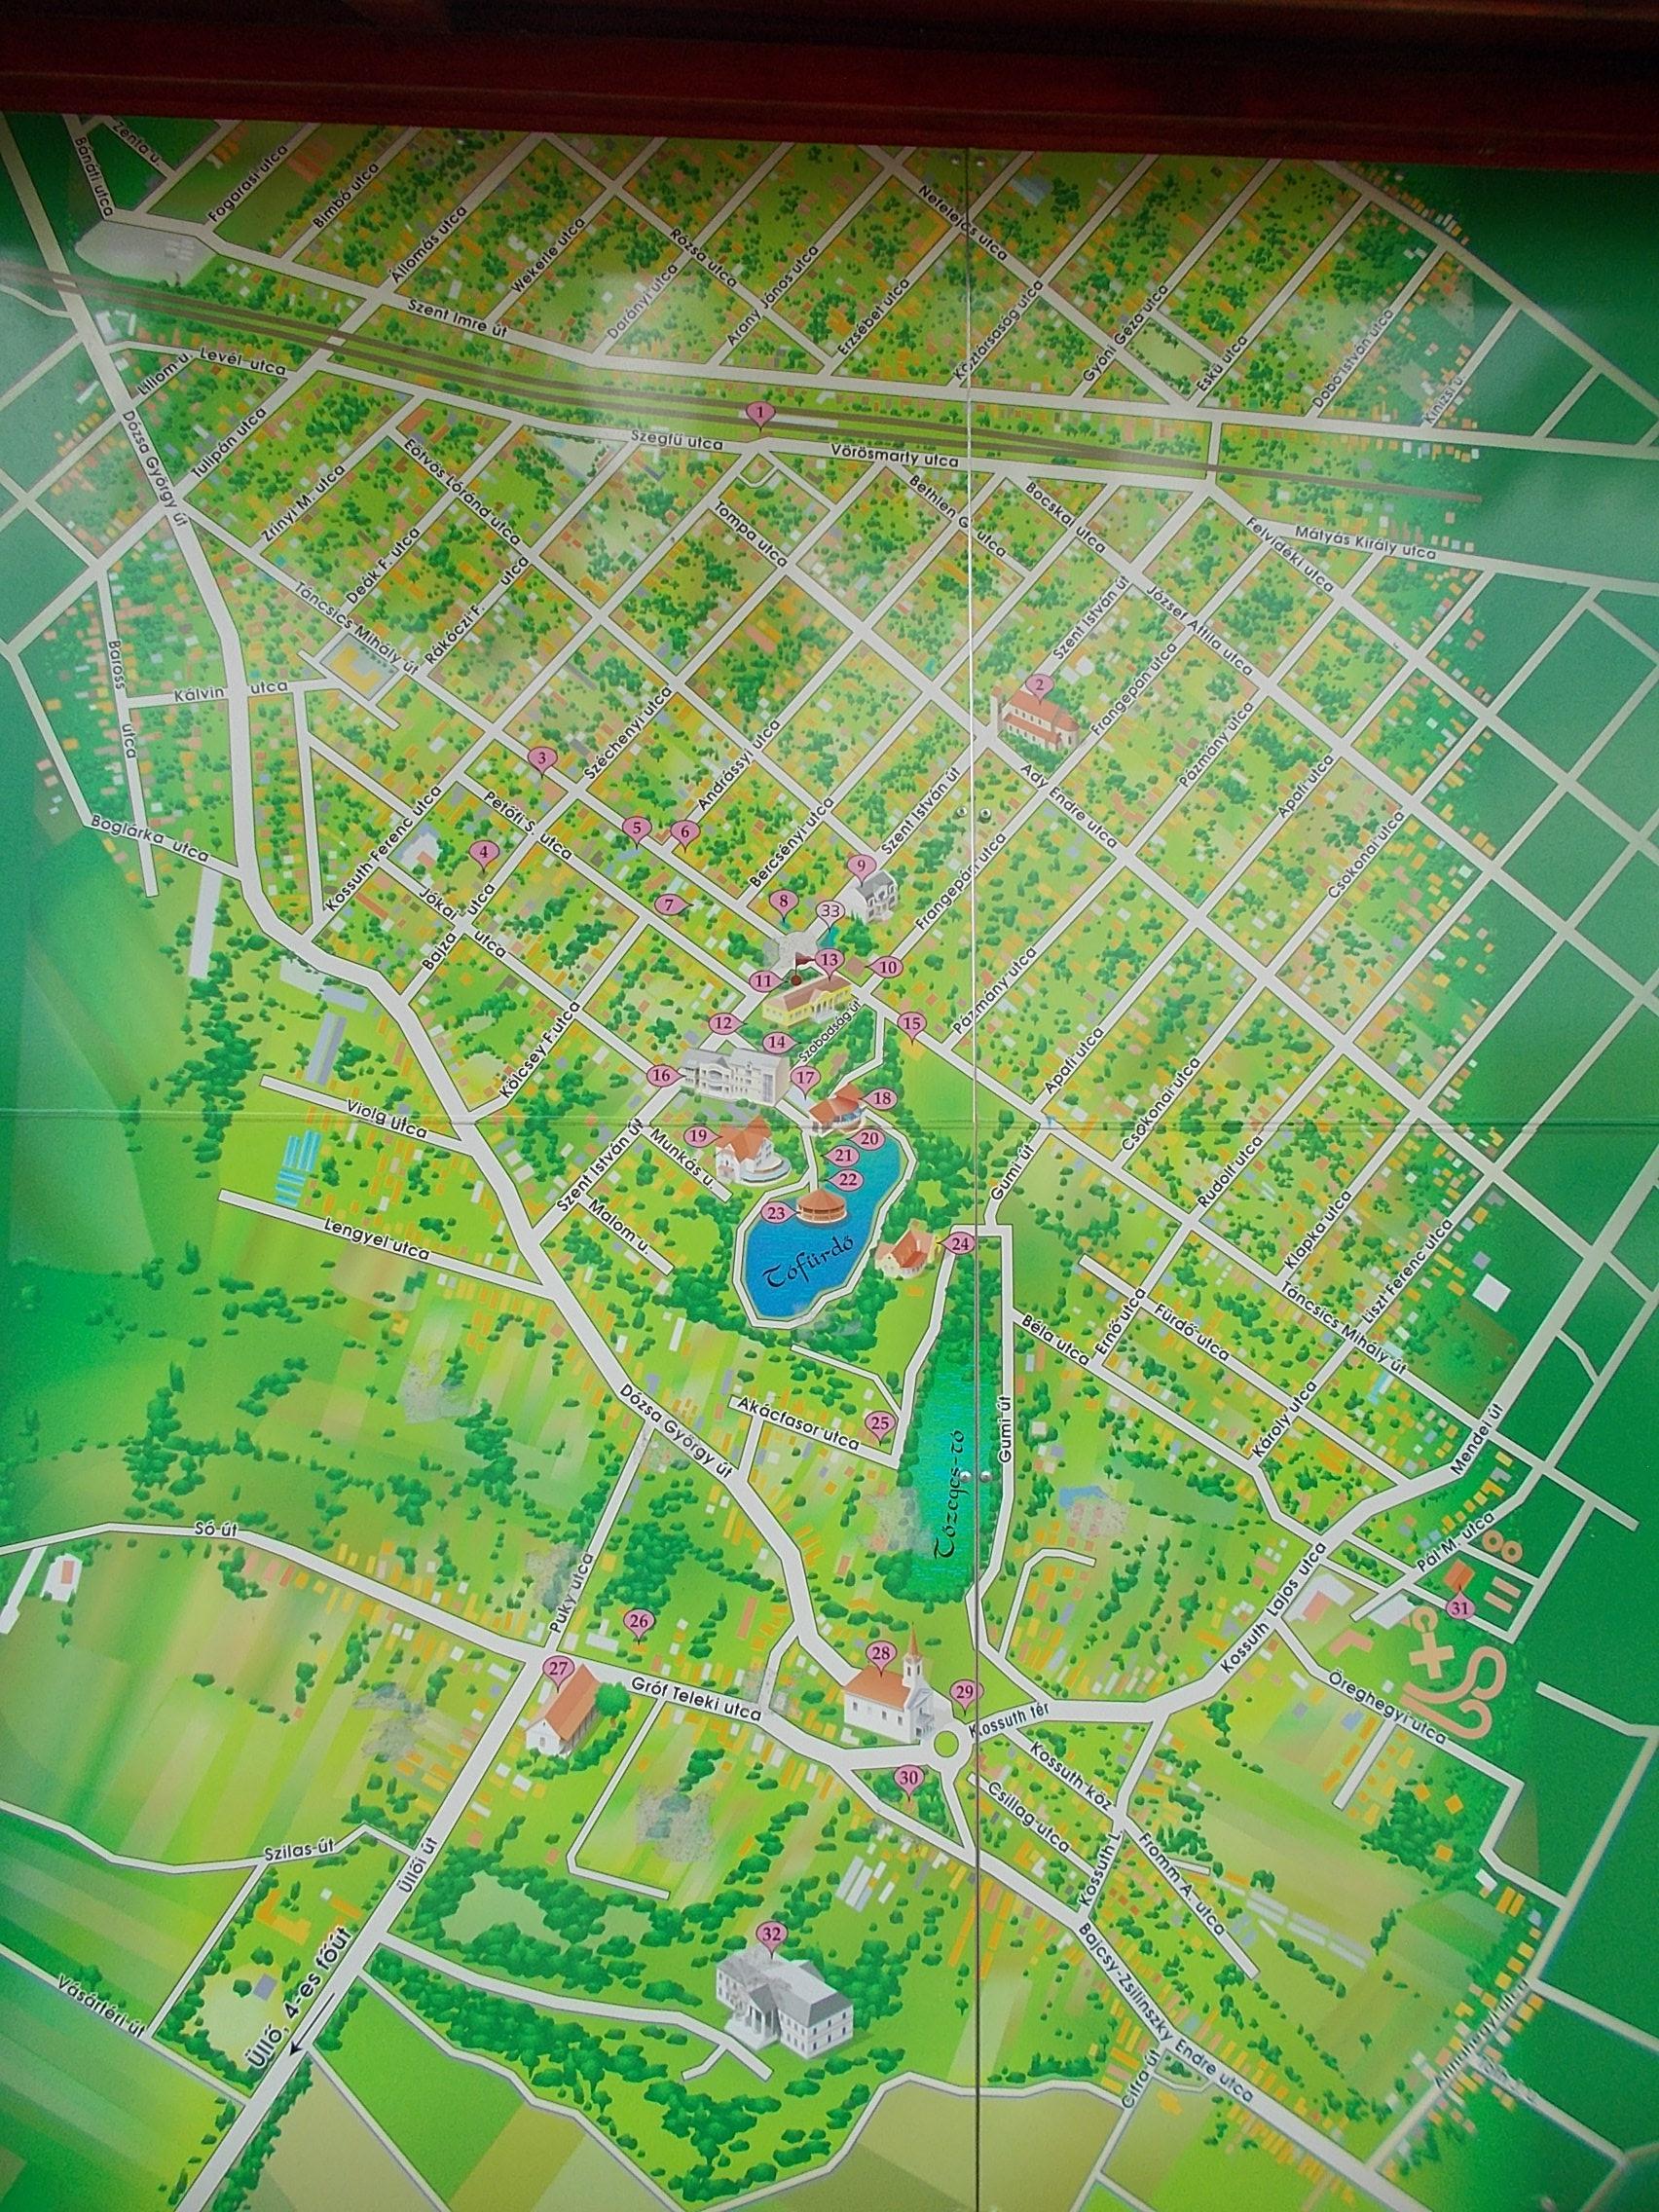 File Map Of Gyomro In The Central Park Gyomro Hungary Jpg